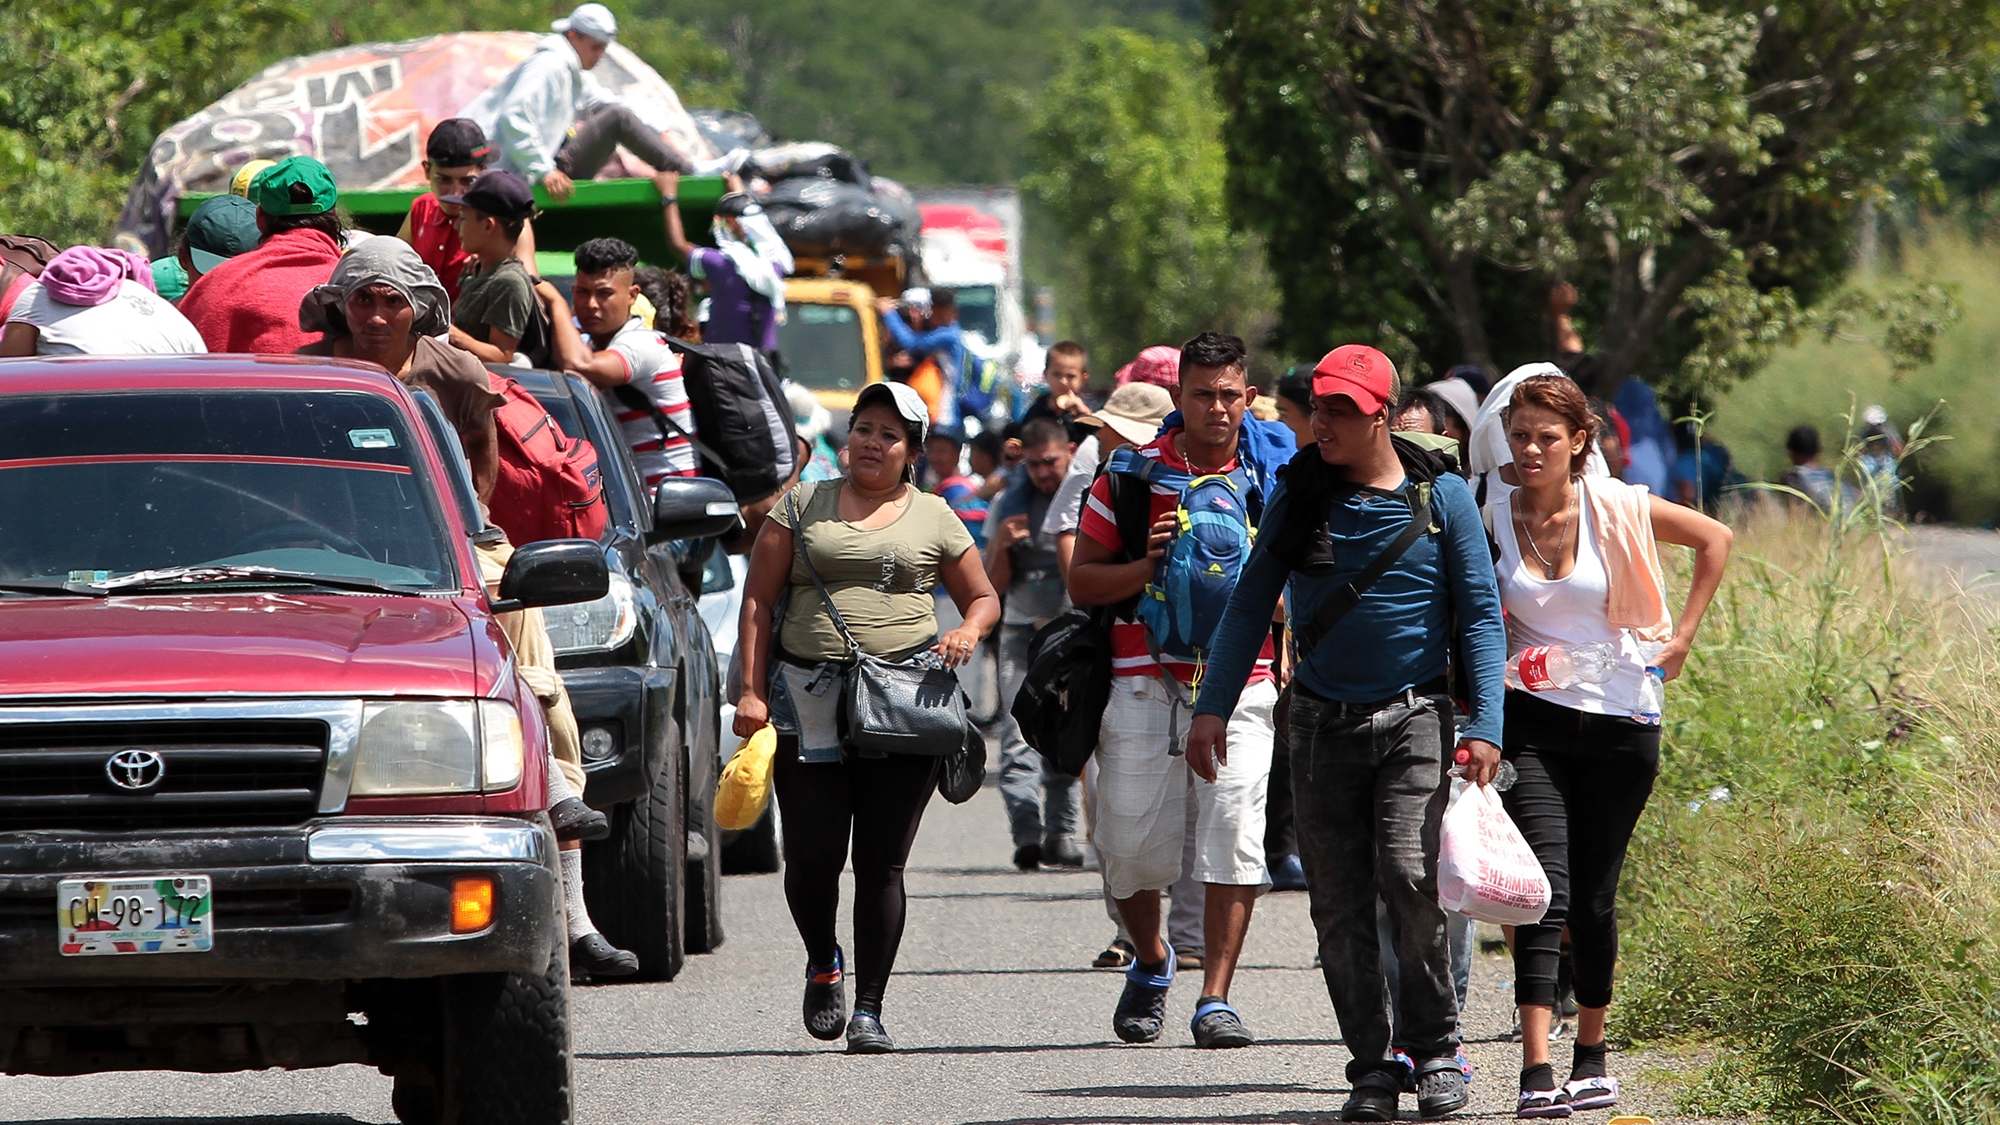 Caravana Migrante comienza a salir de Querétaro